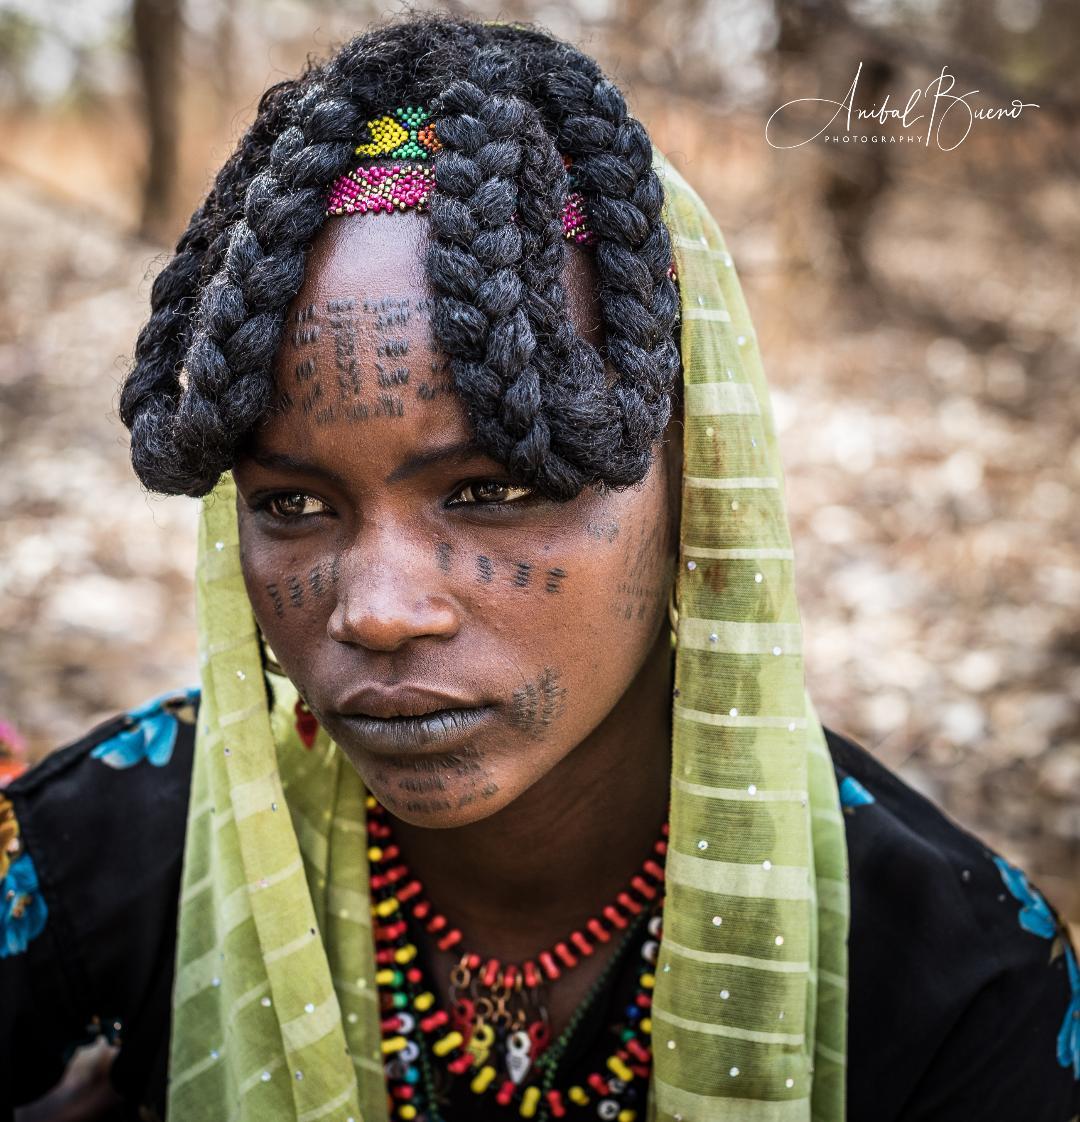 Mujer de color fotografiada por anibal bueno